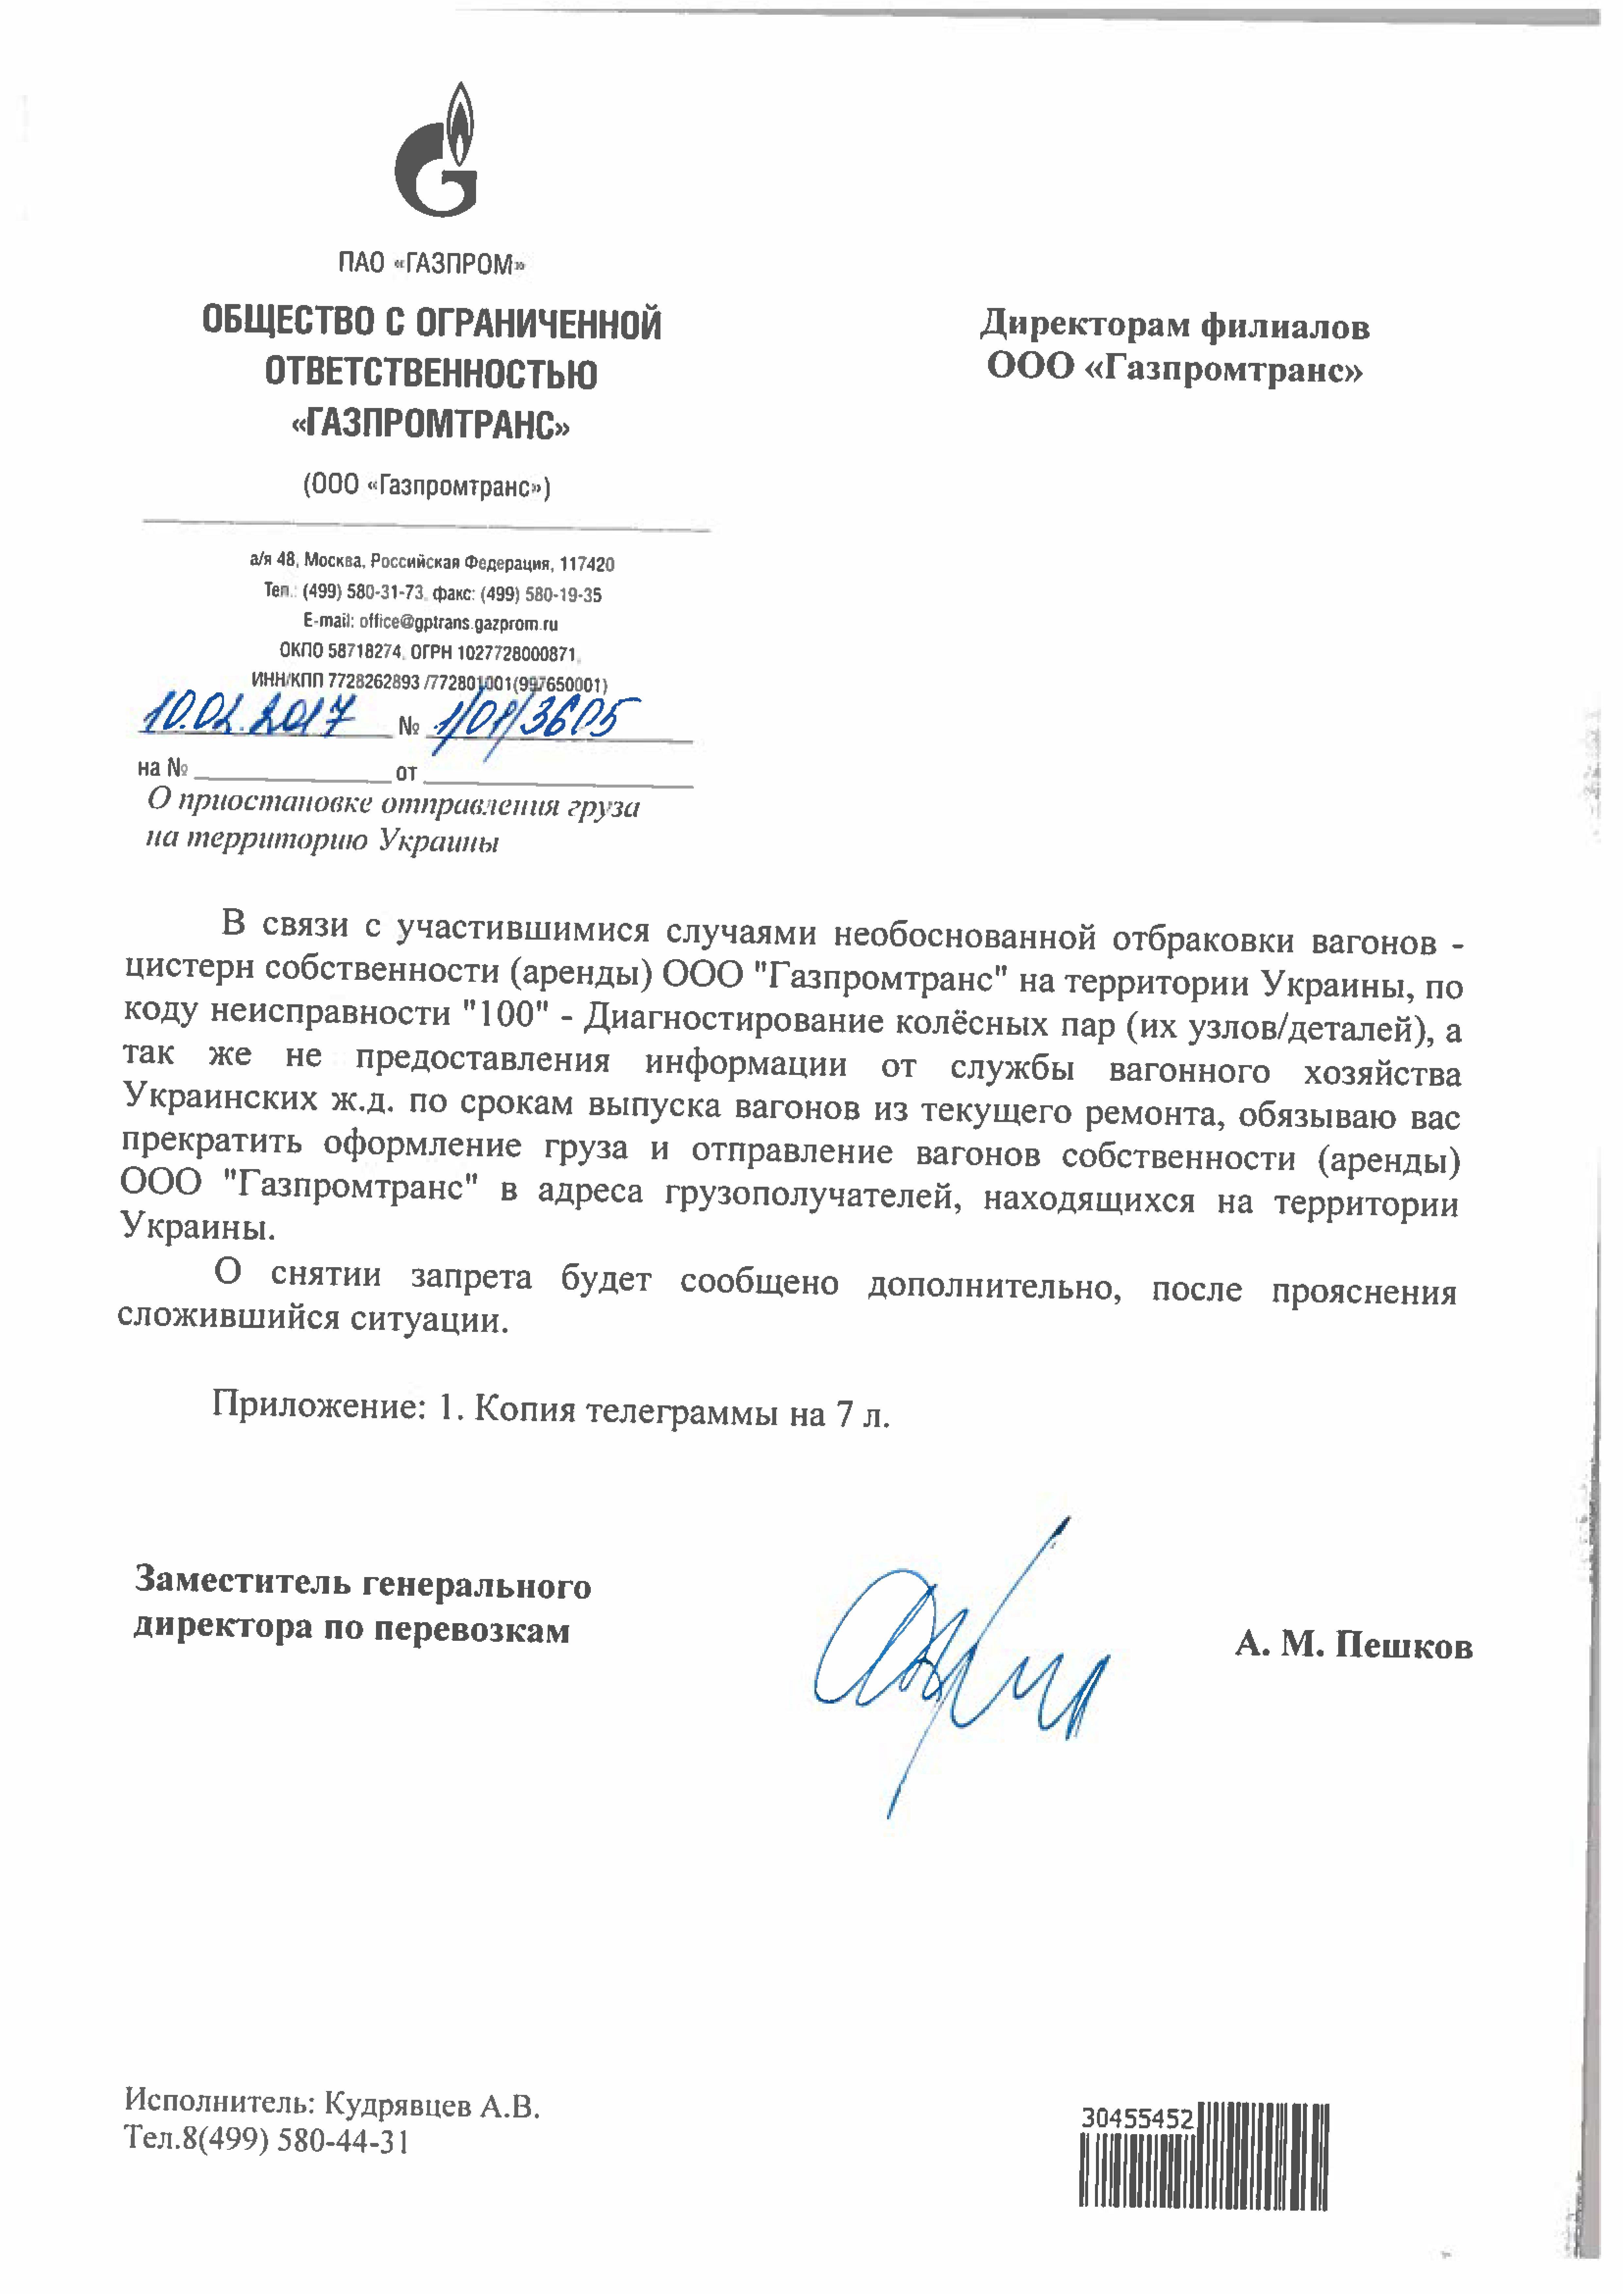 Газпромтранс письмо